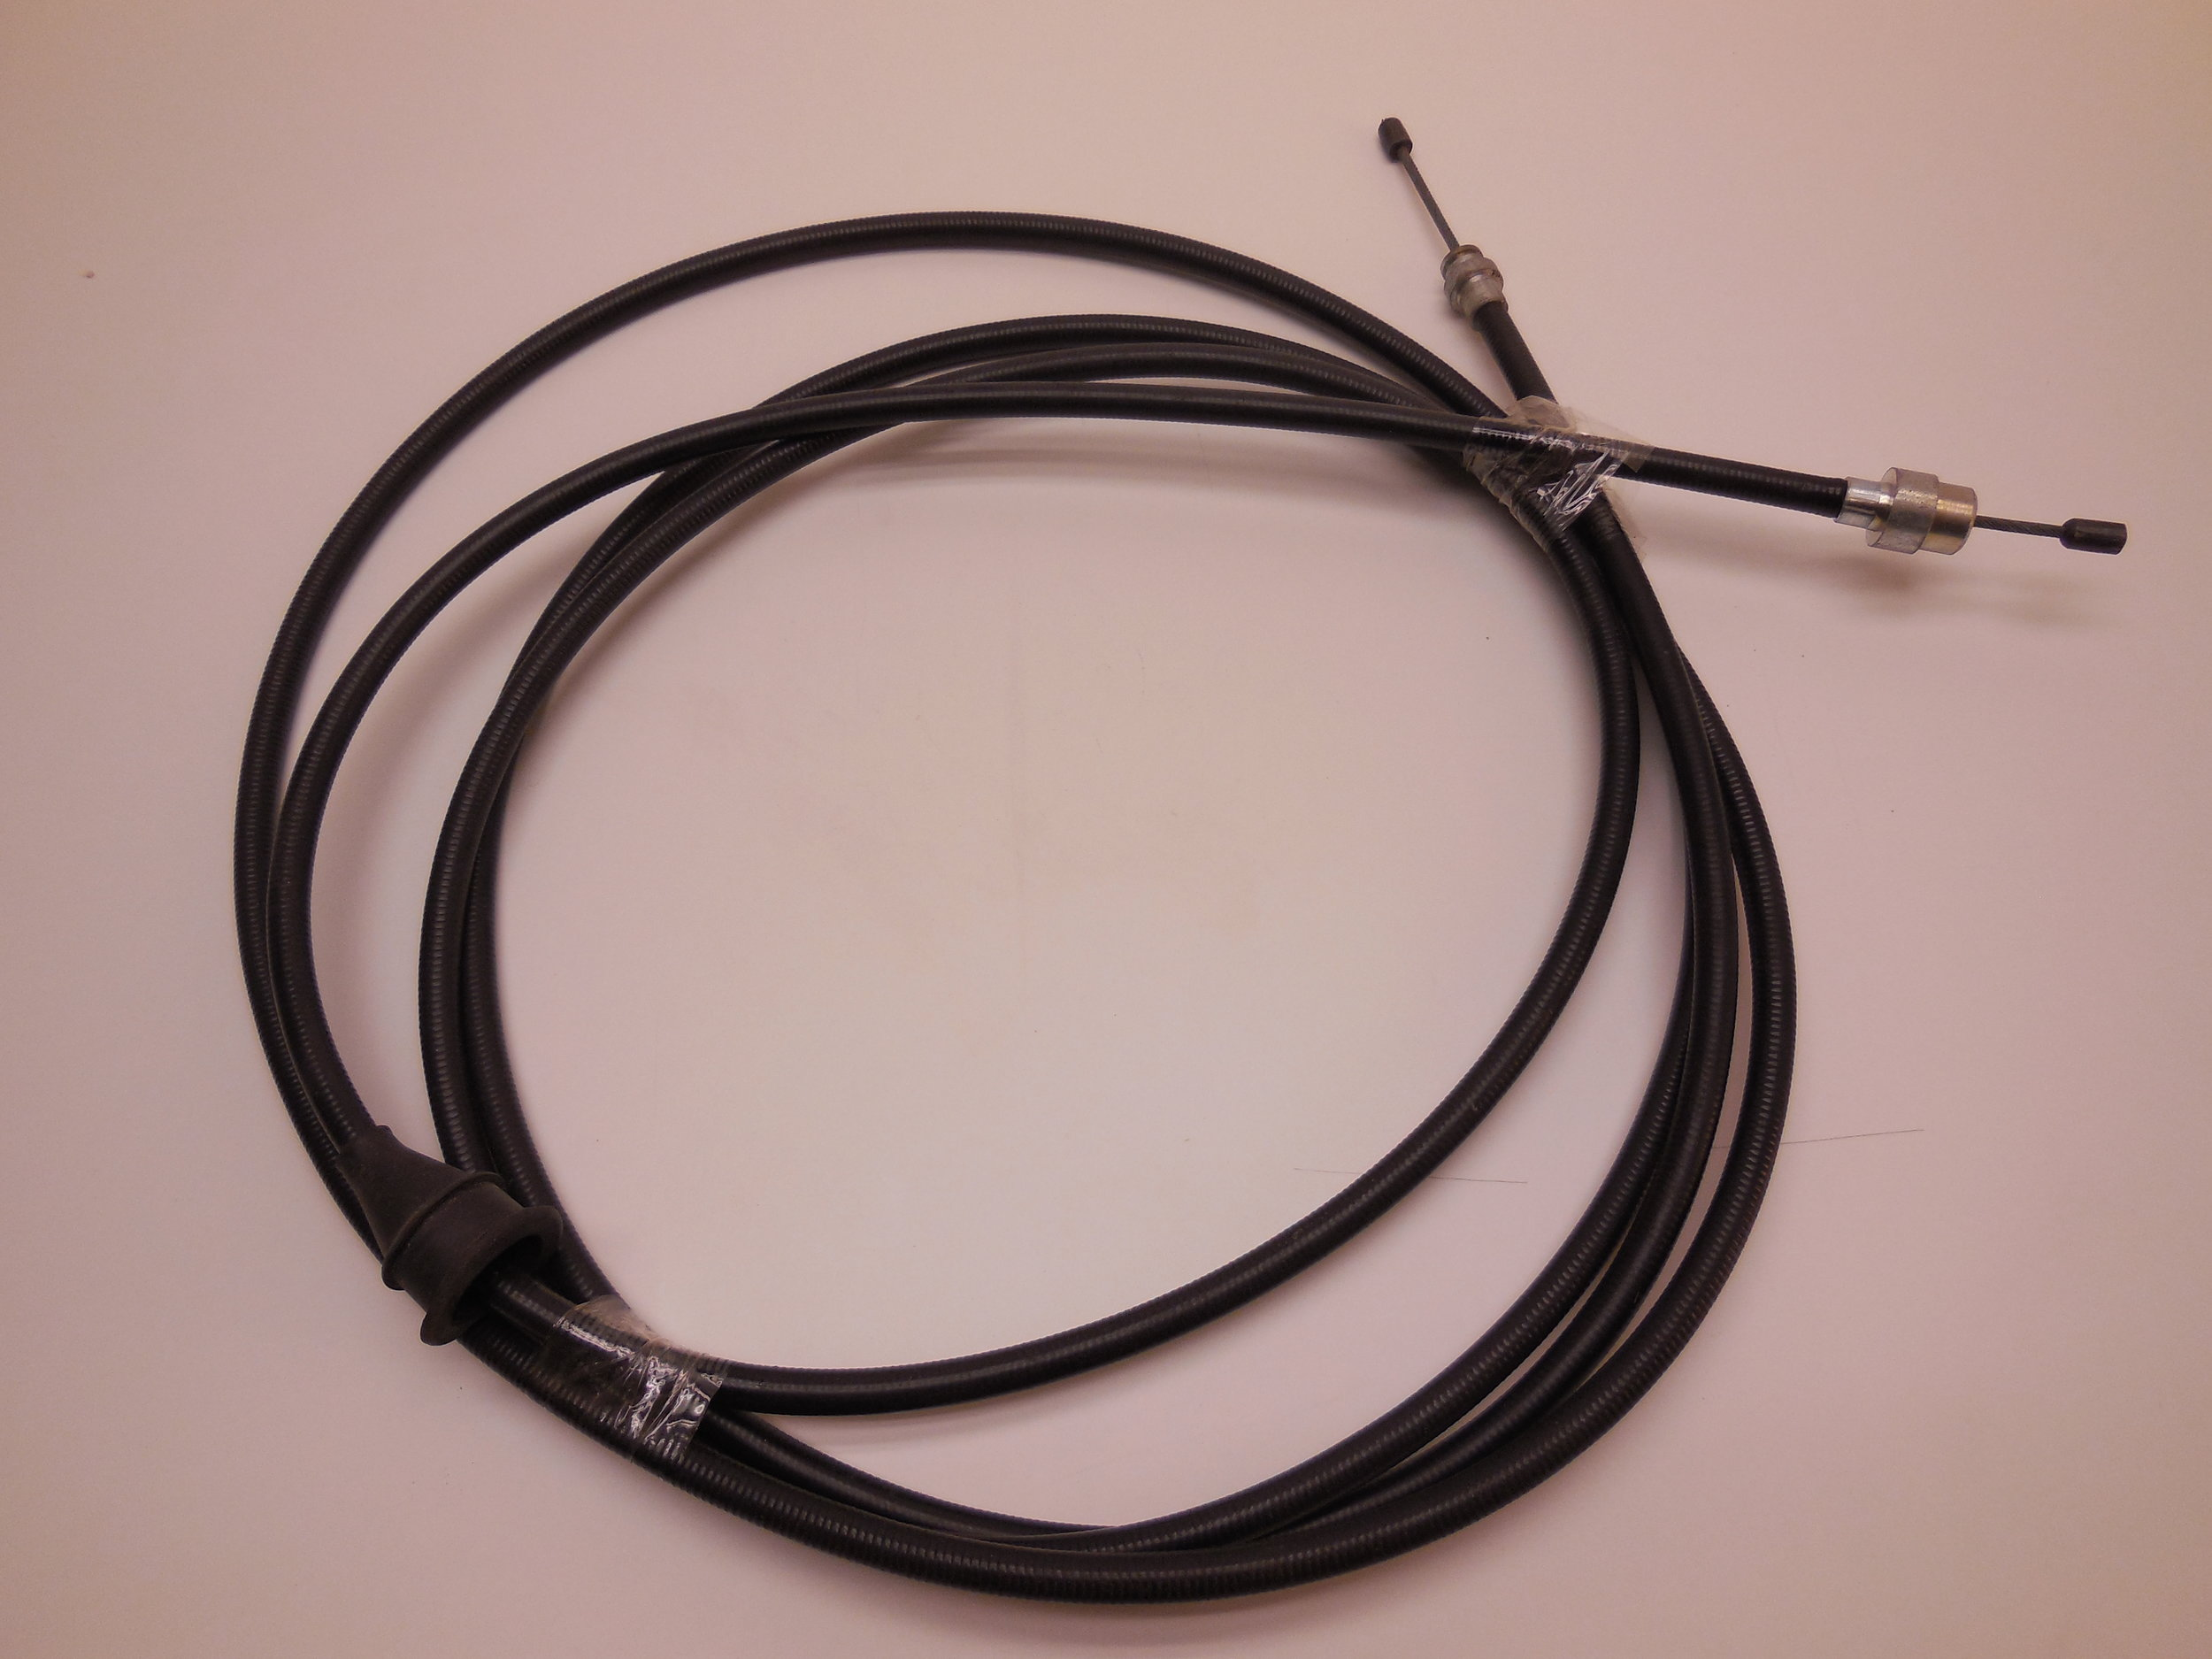 parking Brake wire (softtop) Häggo Nr: 353 6049-802 price: 3900 SEK